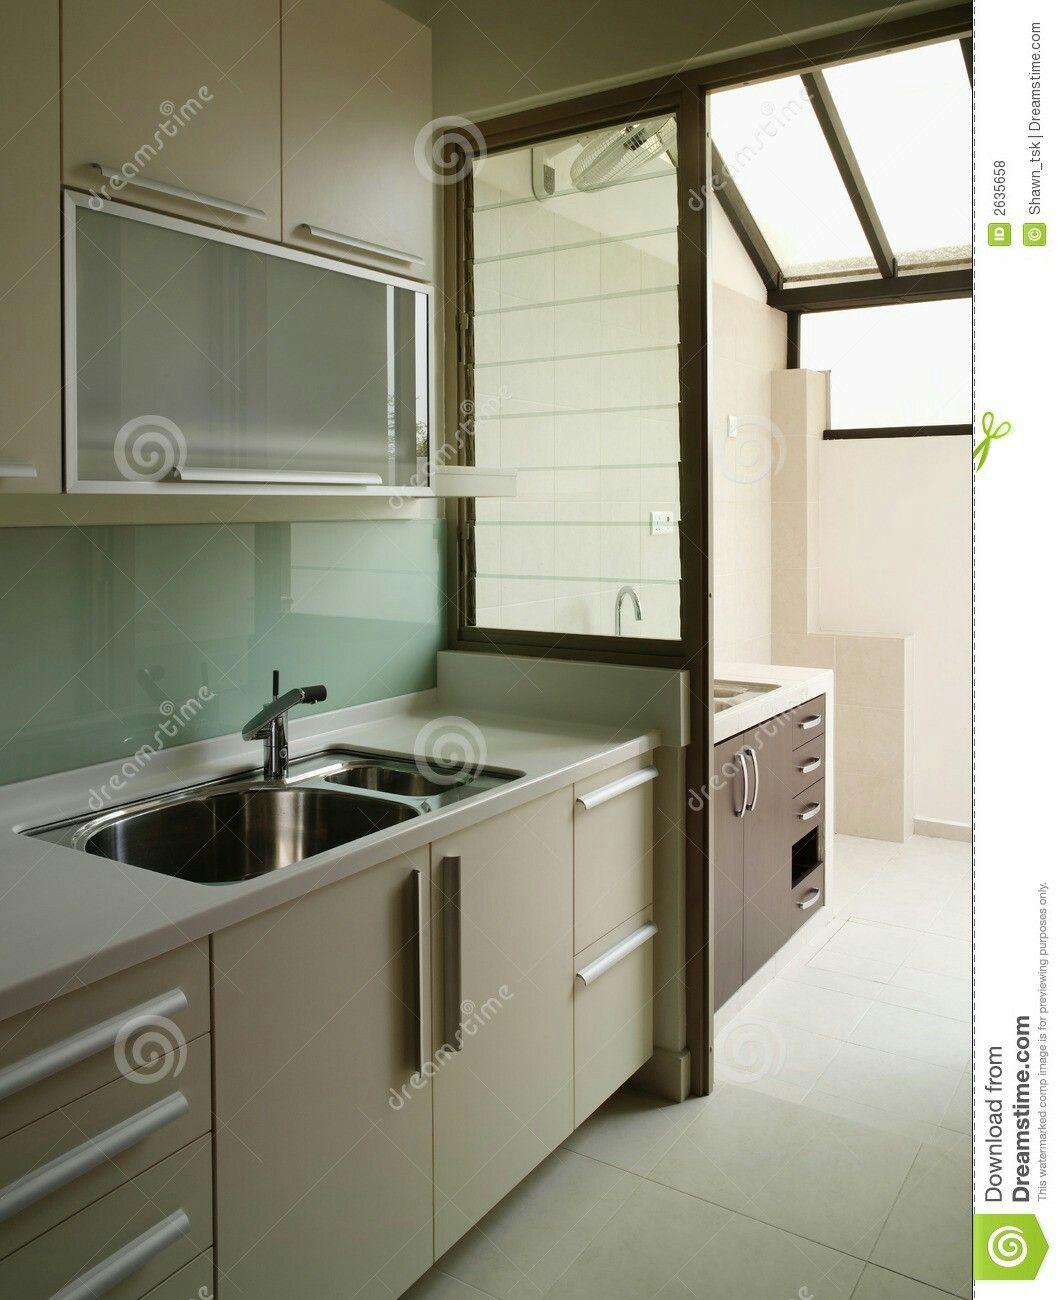 9 Divider wet n dry ideas   interior, home, home decor